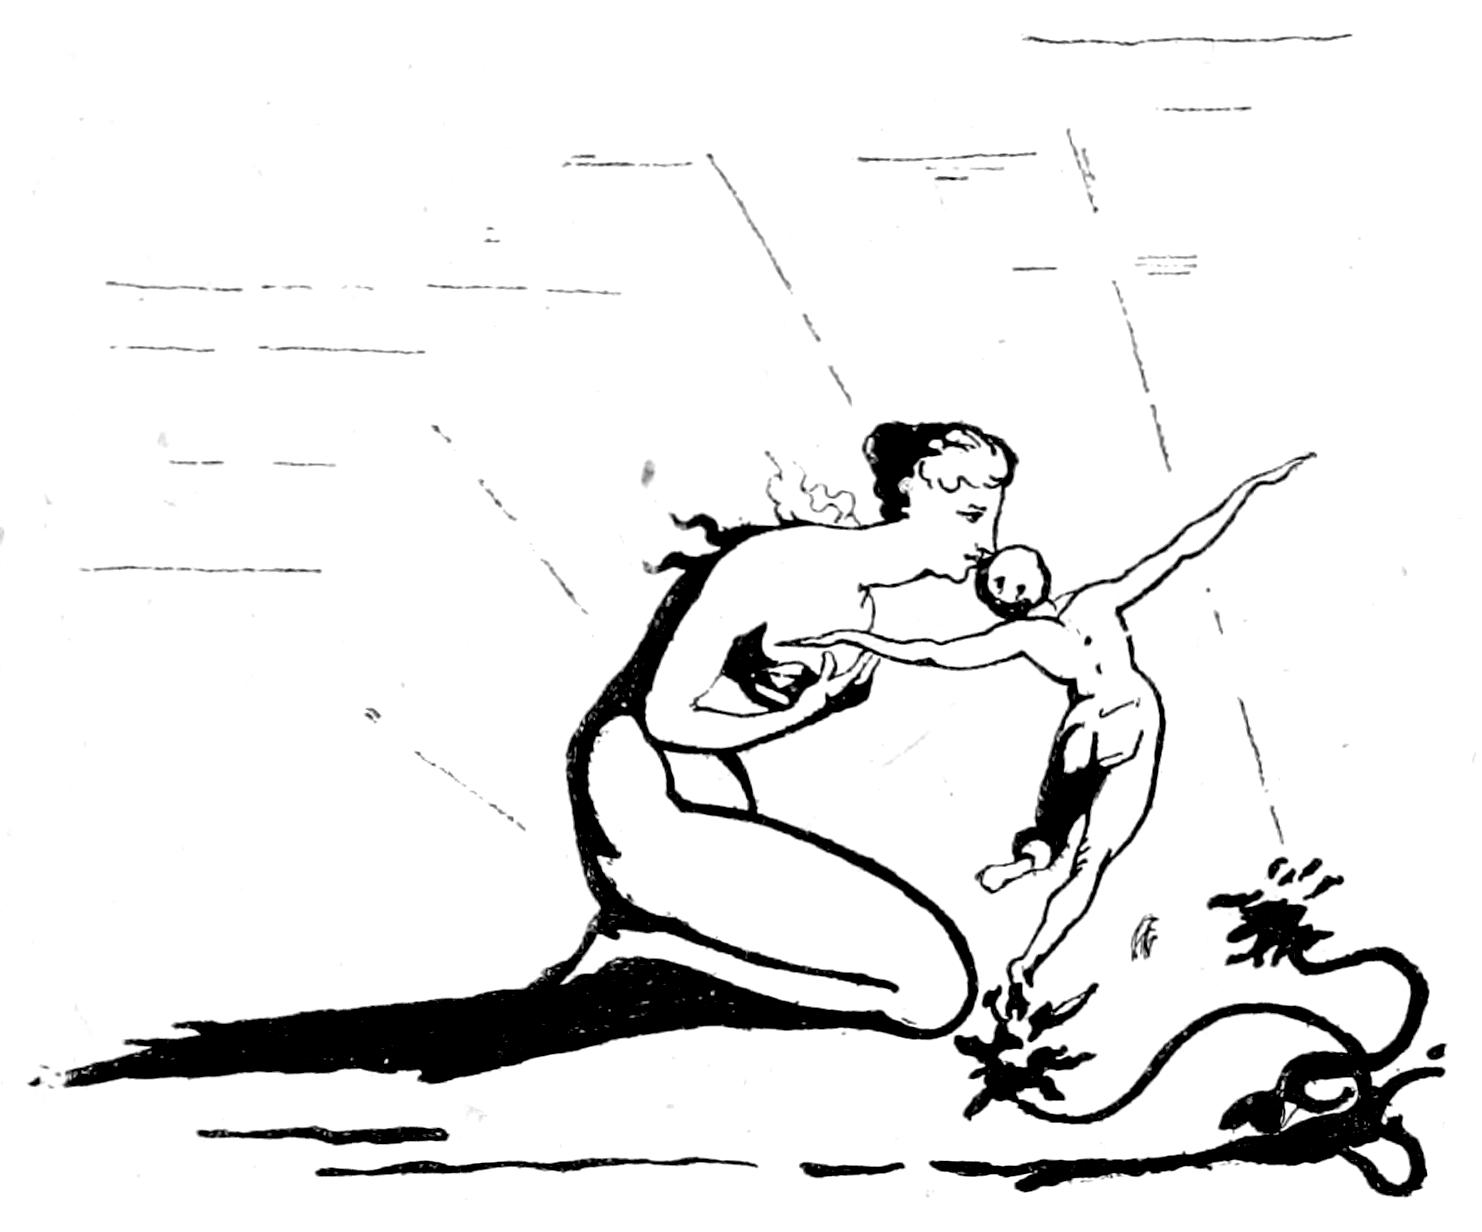 File:Life of William Blake (1880), volume 1, page 103.png